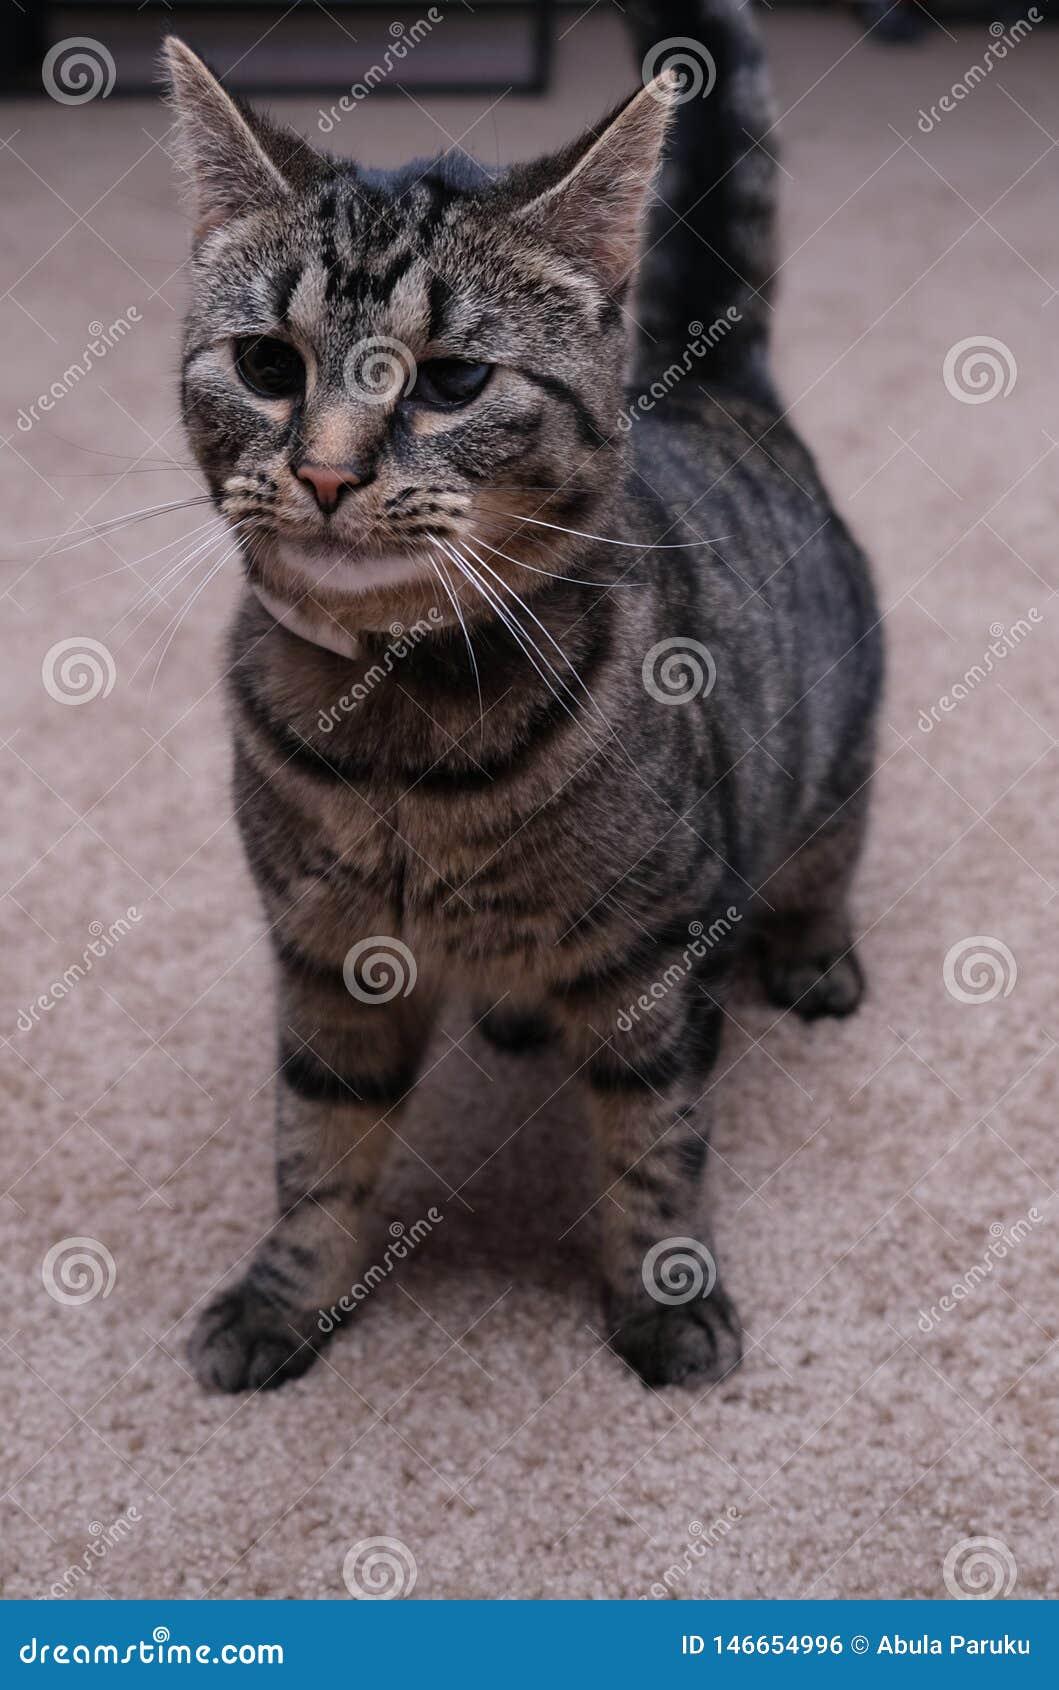 Cat Indoors With Dark Eyes sveglia